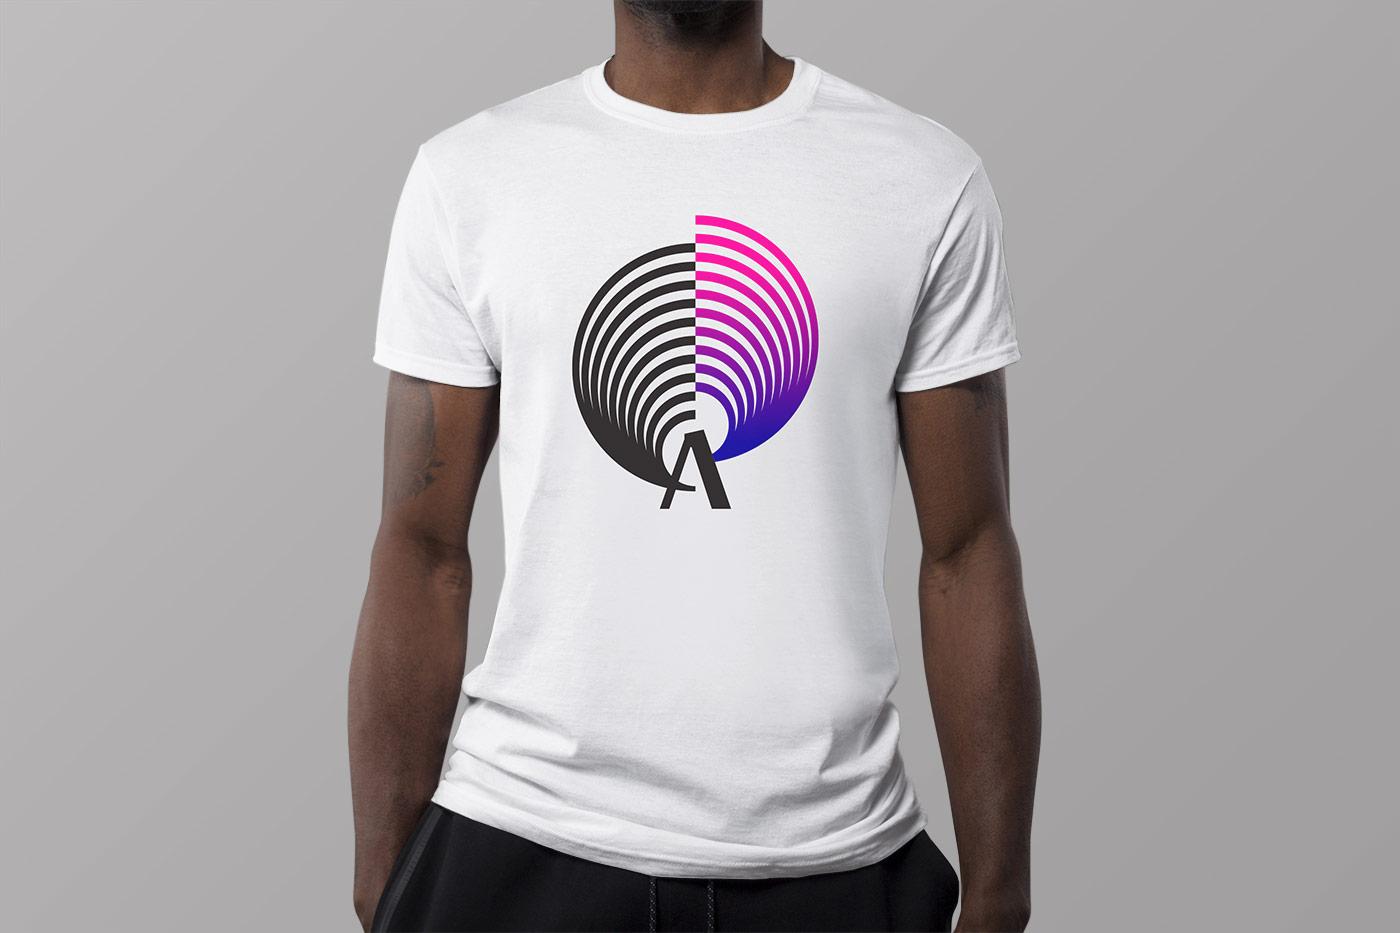 Man wearing white t-shirt with Amplified Opera logo